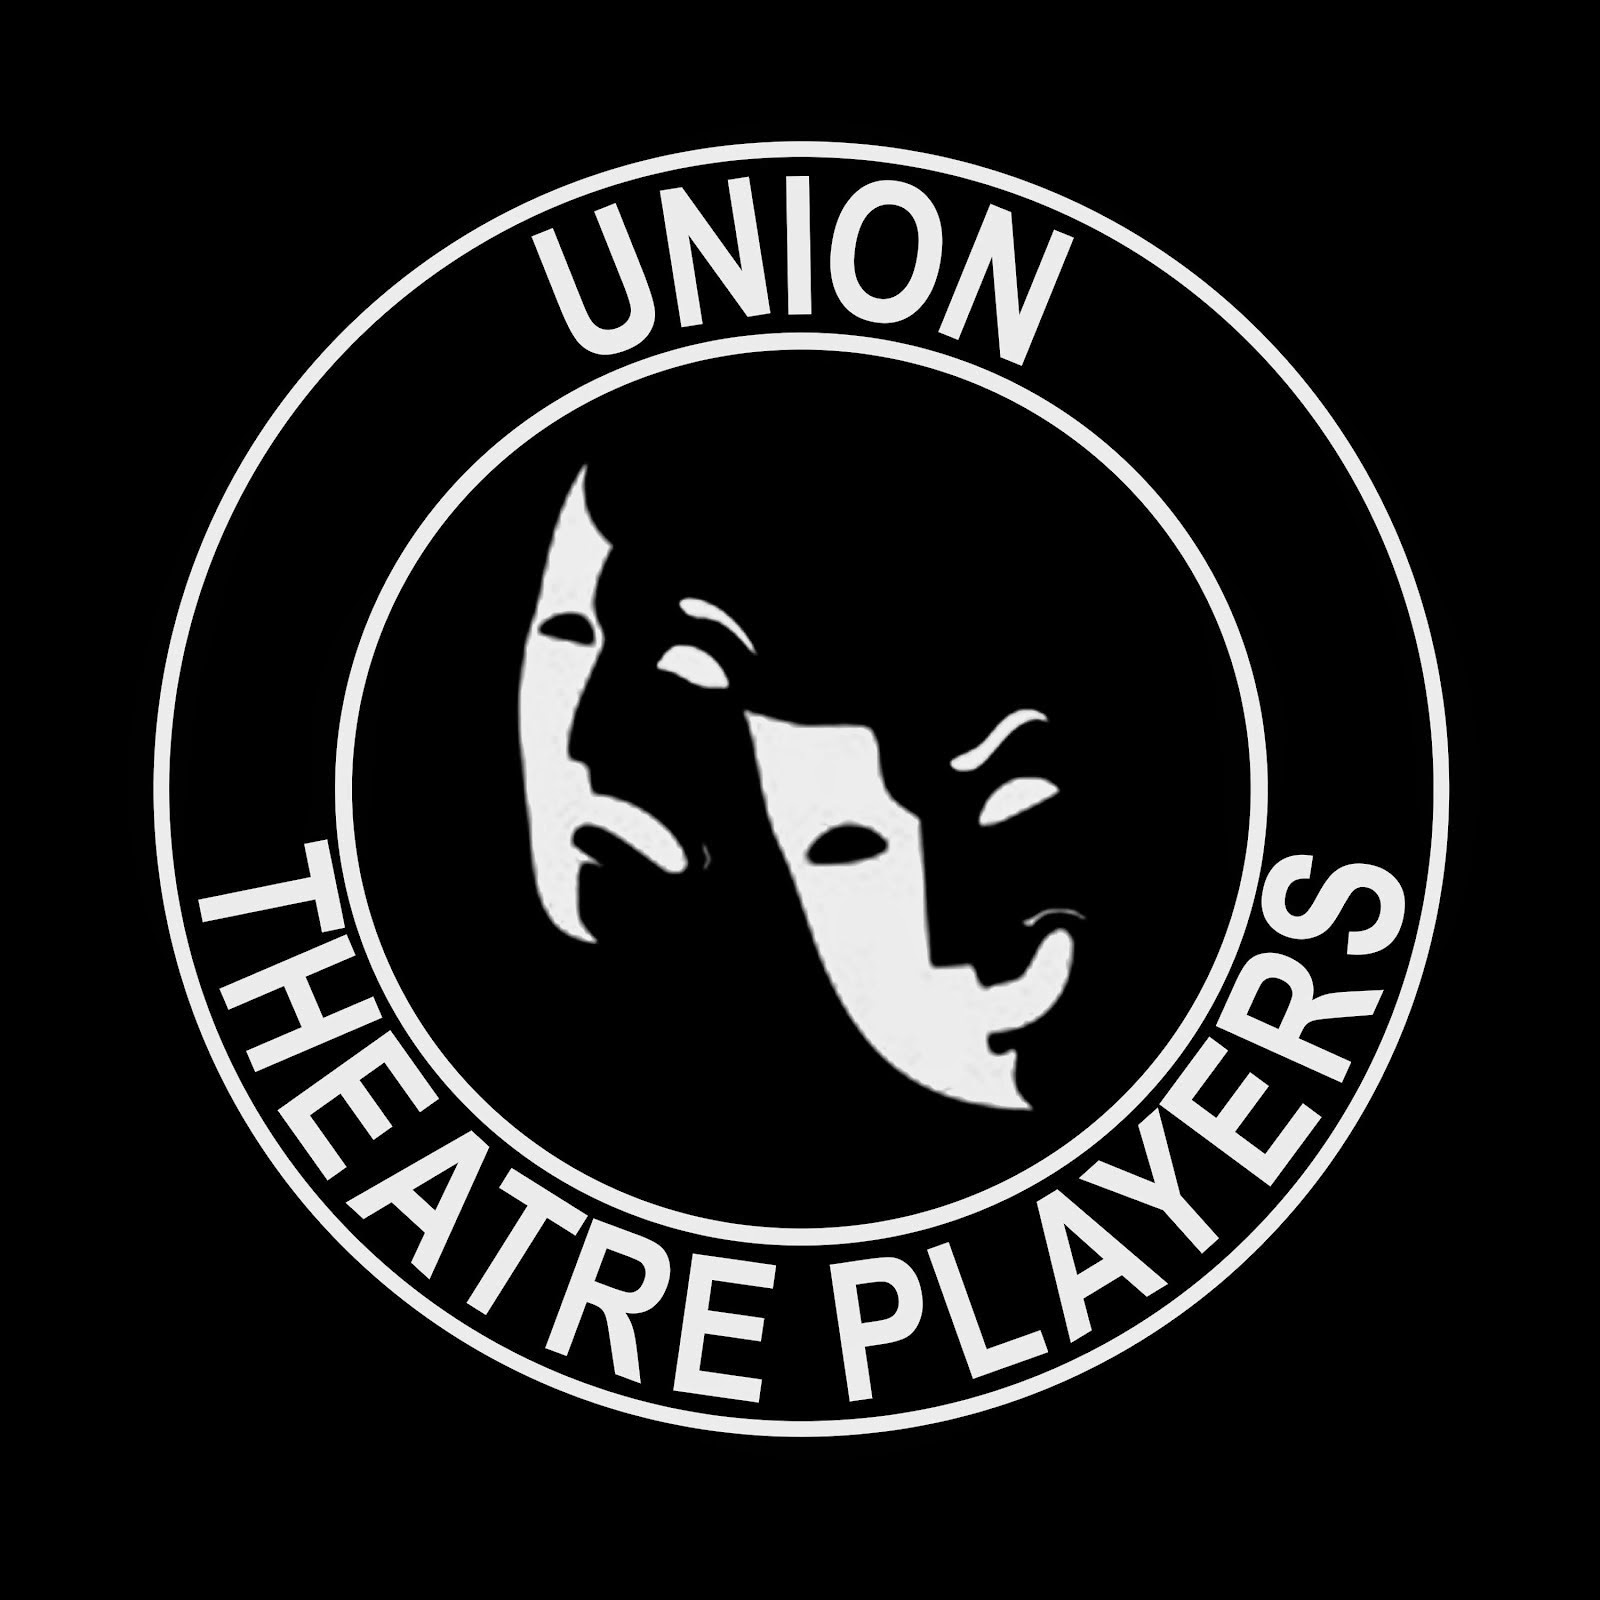 Union Theatre Players